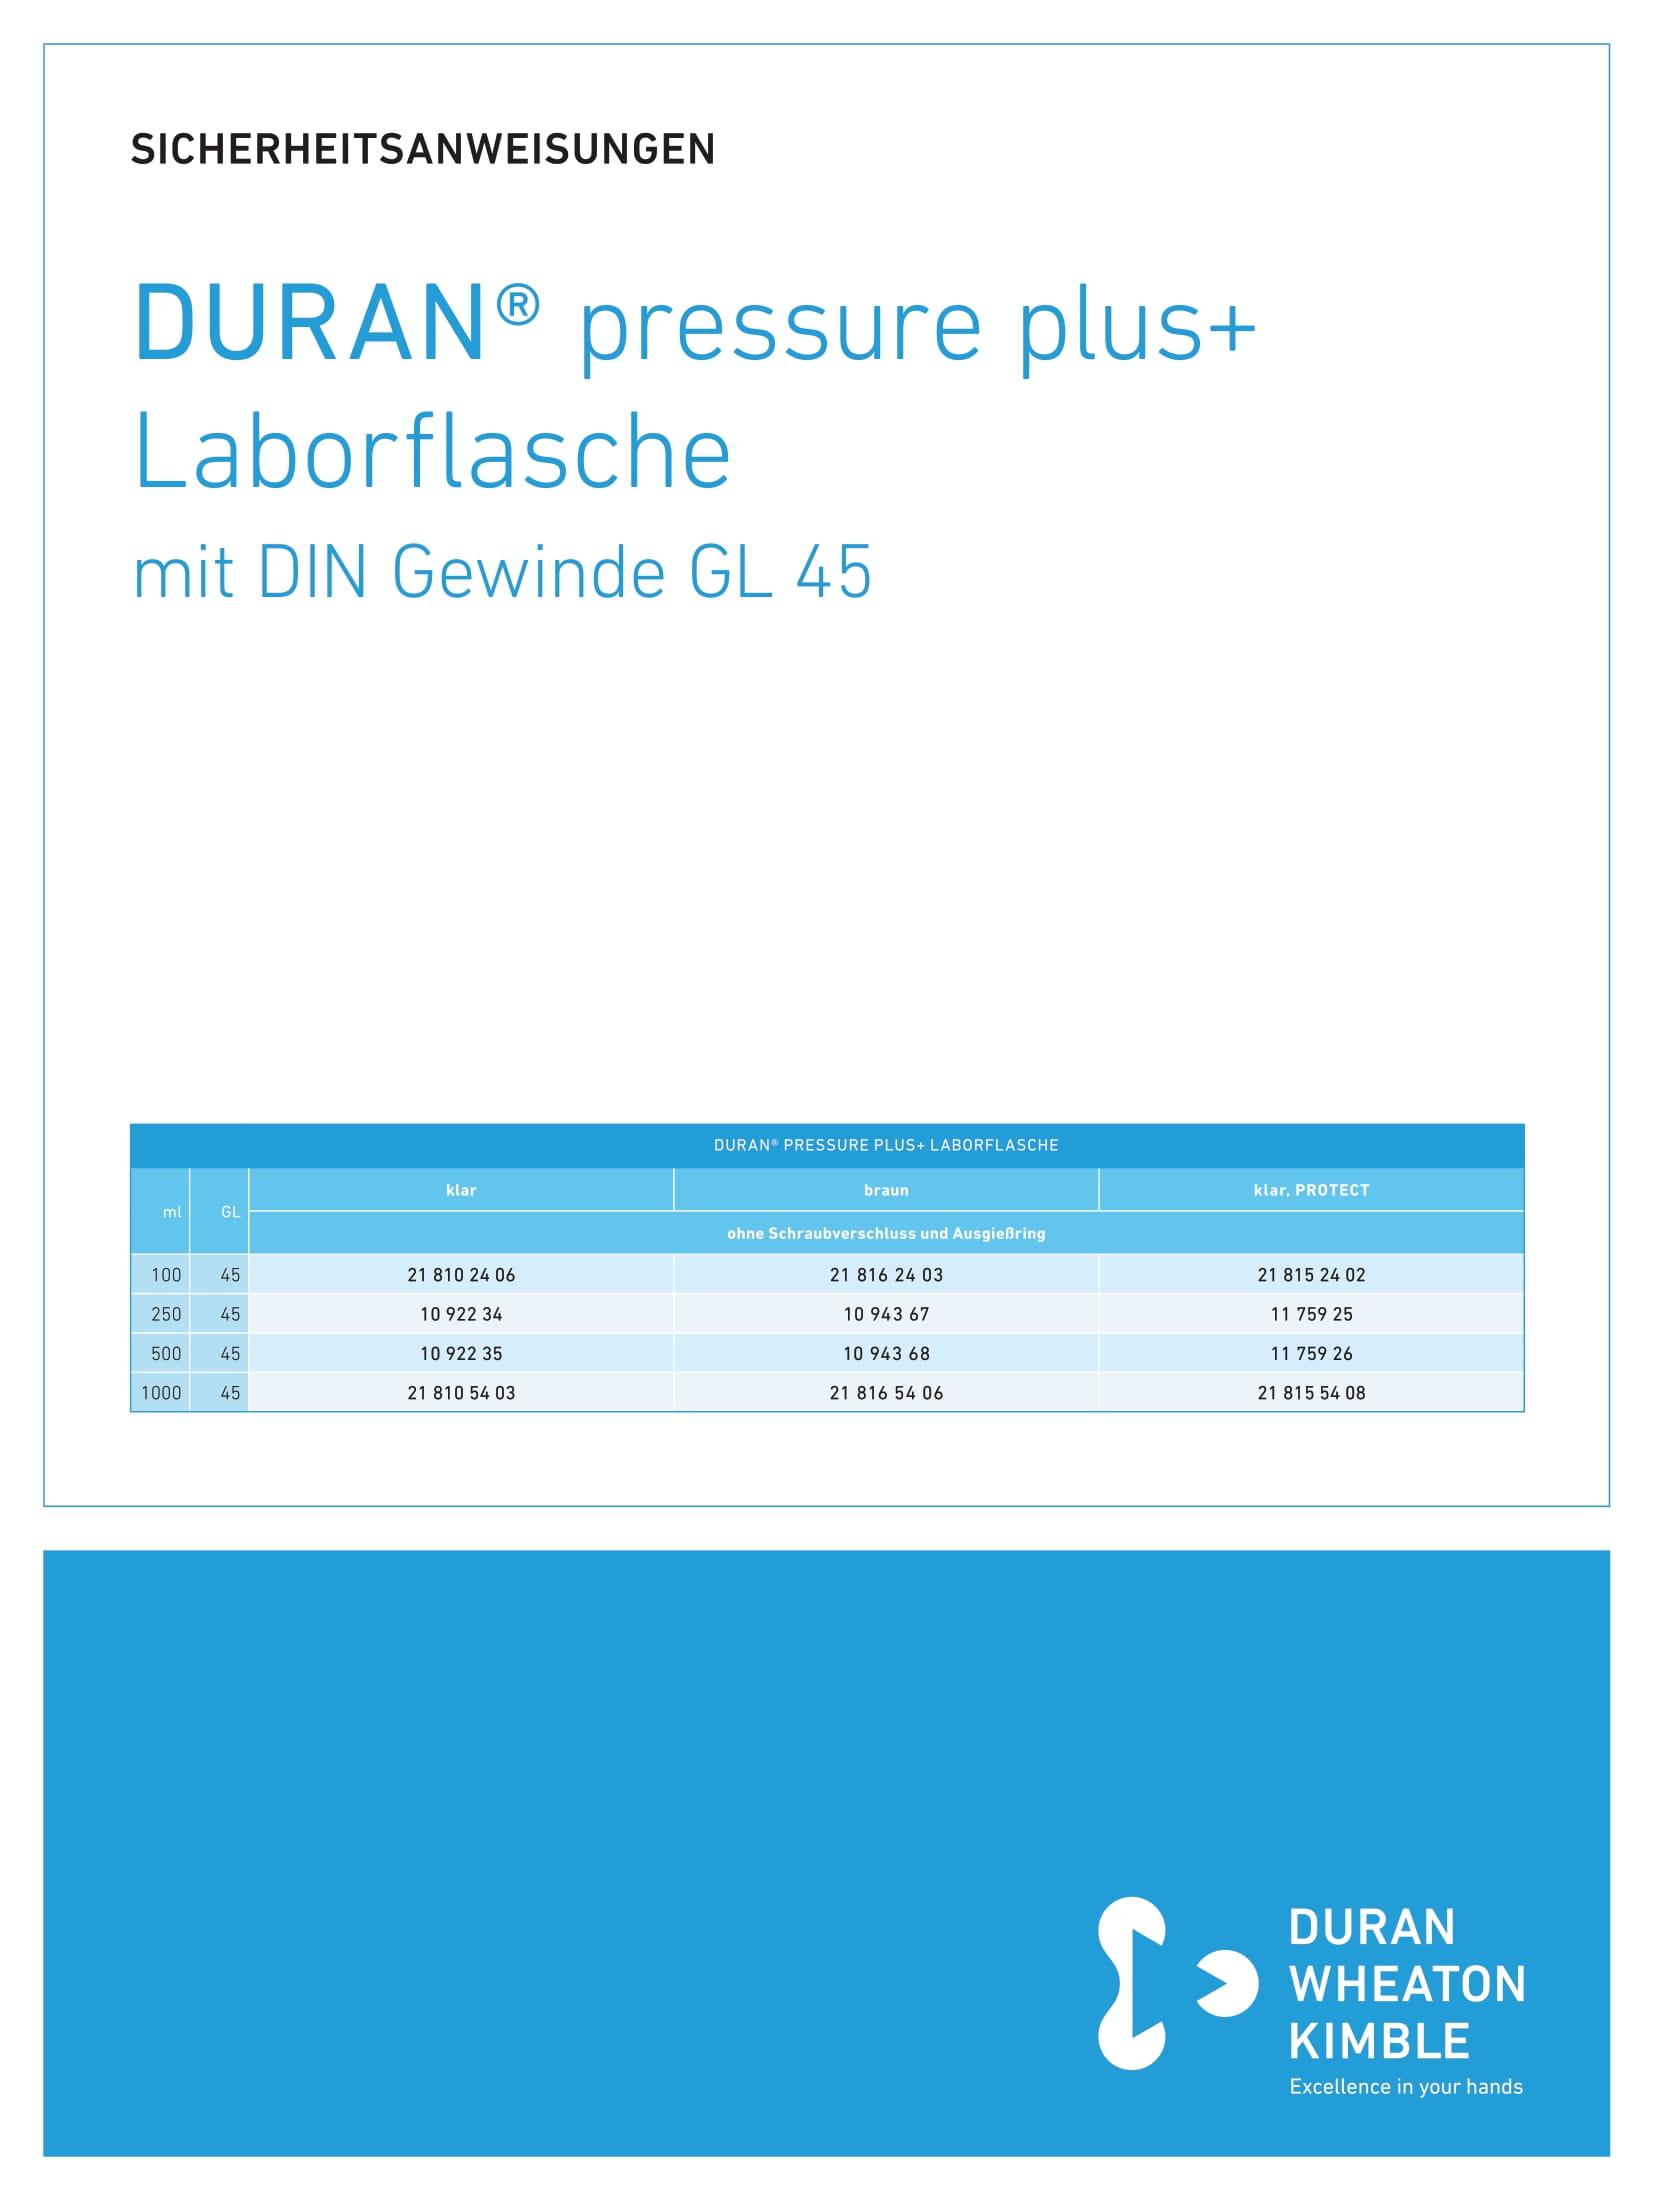 DWK SAFETY INSTRUCTIONS DURAN® pressure plus+ Laboratory Bottle